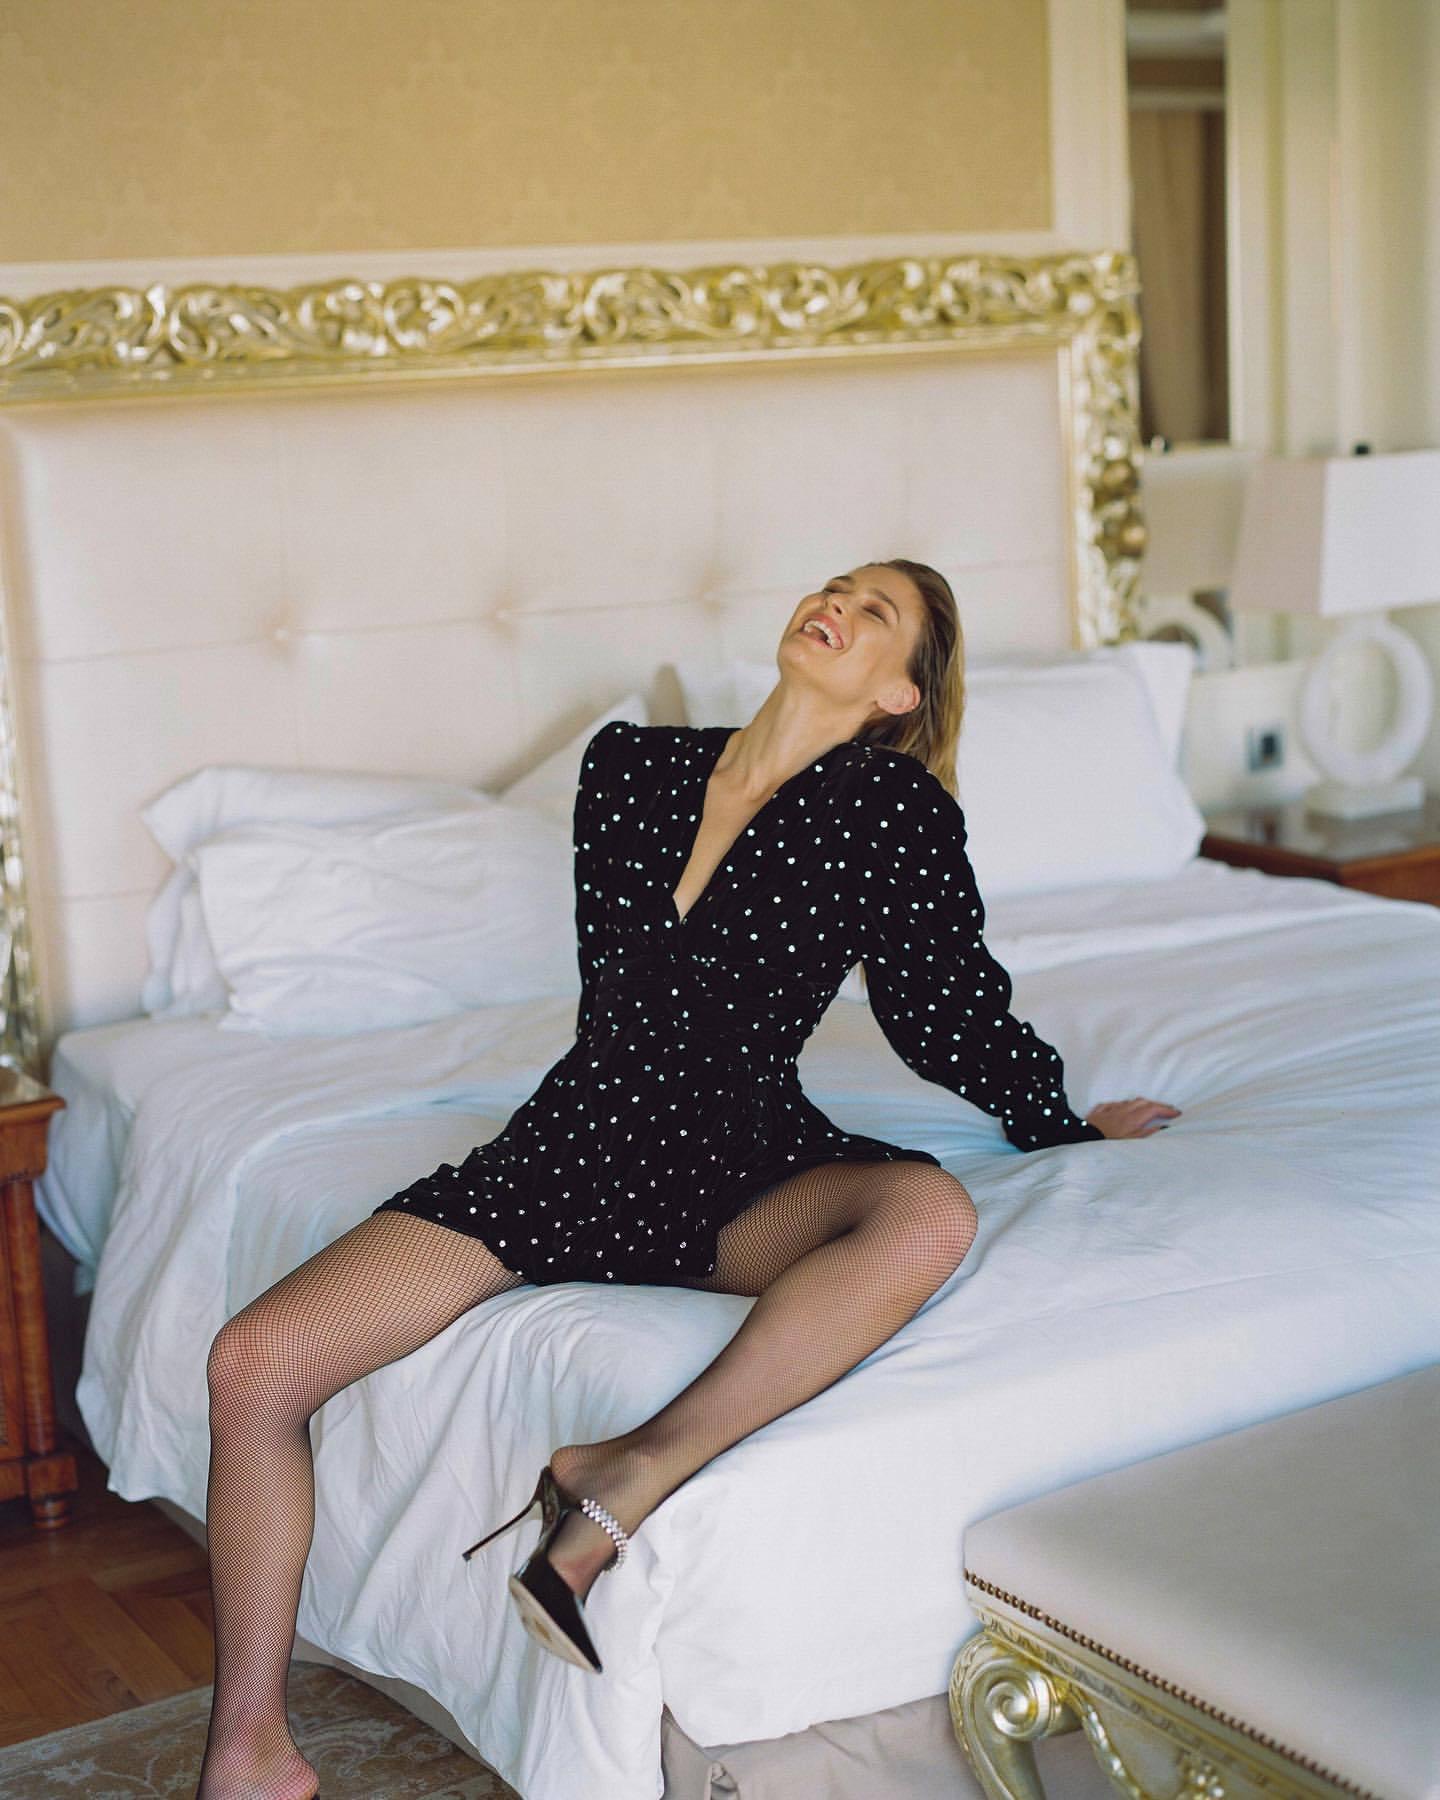 Bar Refaeli – Sexy Legs In Photoshoot For Dodo Bar Or Clothing Line 0005